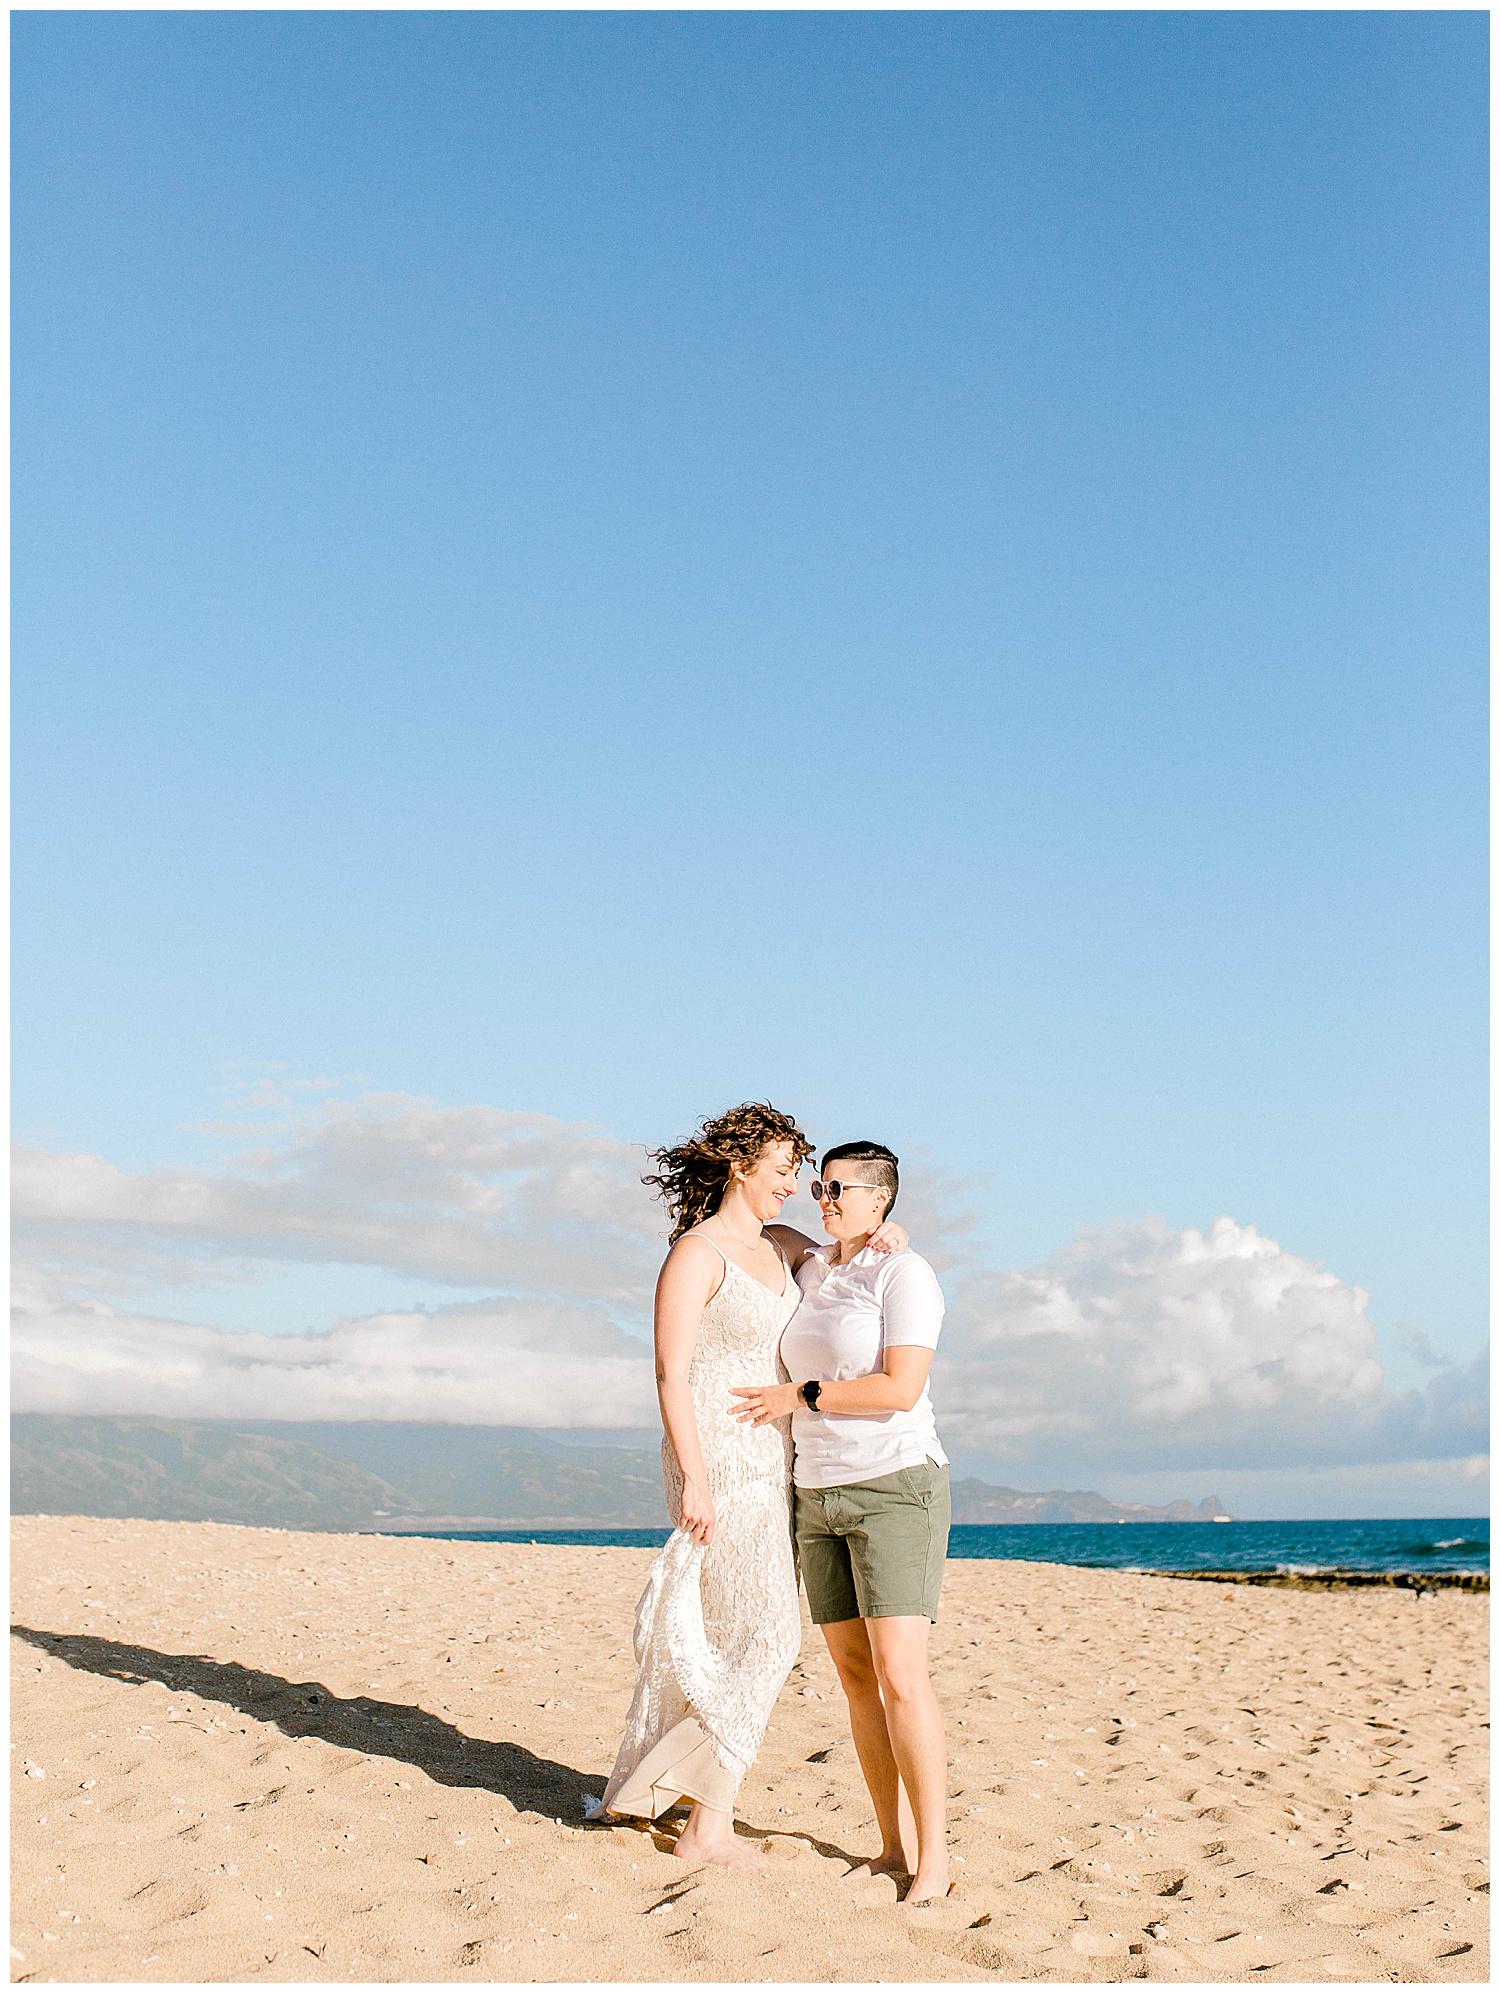 Honeymoon-Photo-Session-Maui-North-Shore_0018.jpg